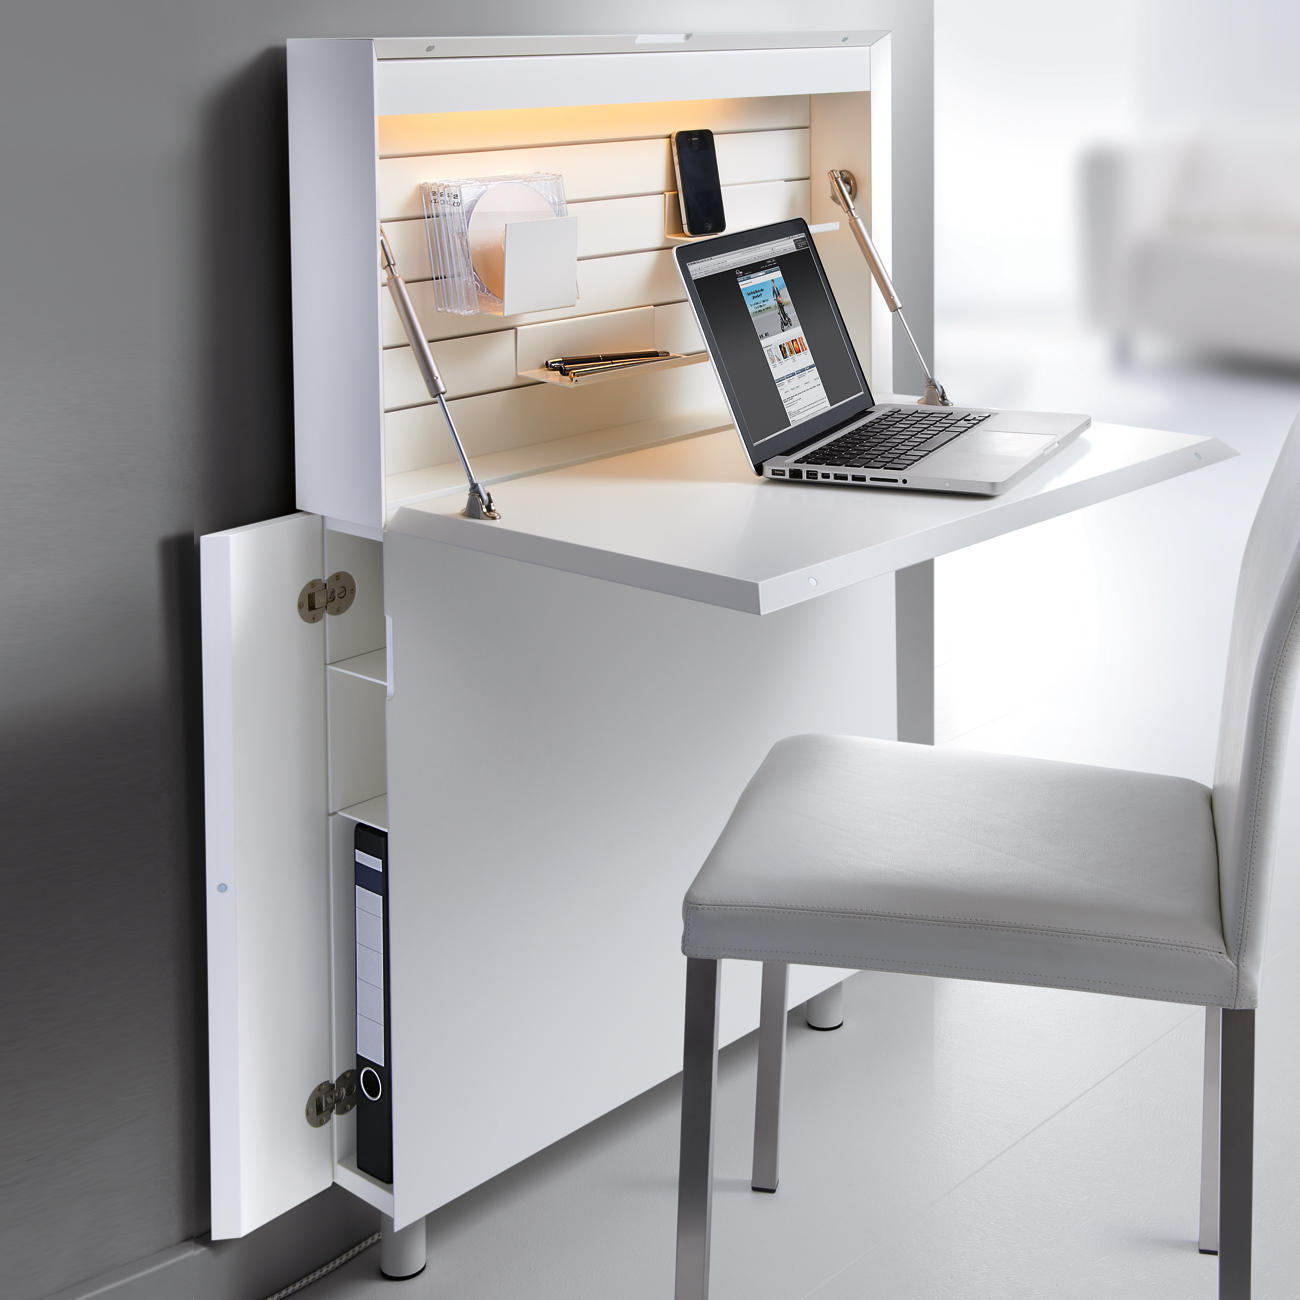 ultraflacher sekret r 3 jahre garantie pro idee. Black Bedroom Furniture Sets. Home Design Ideas